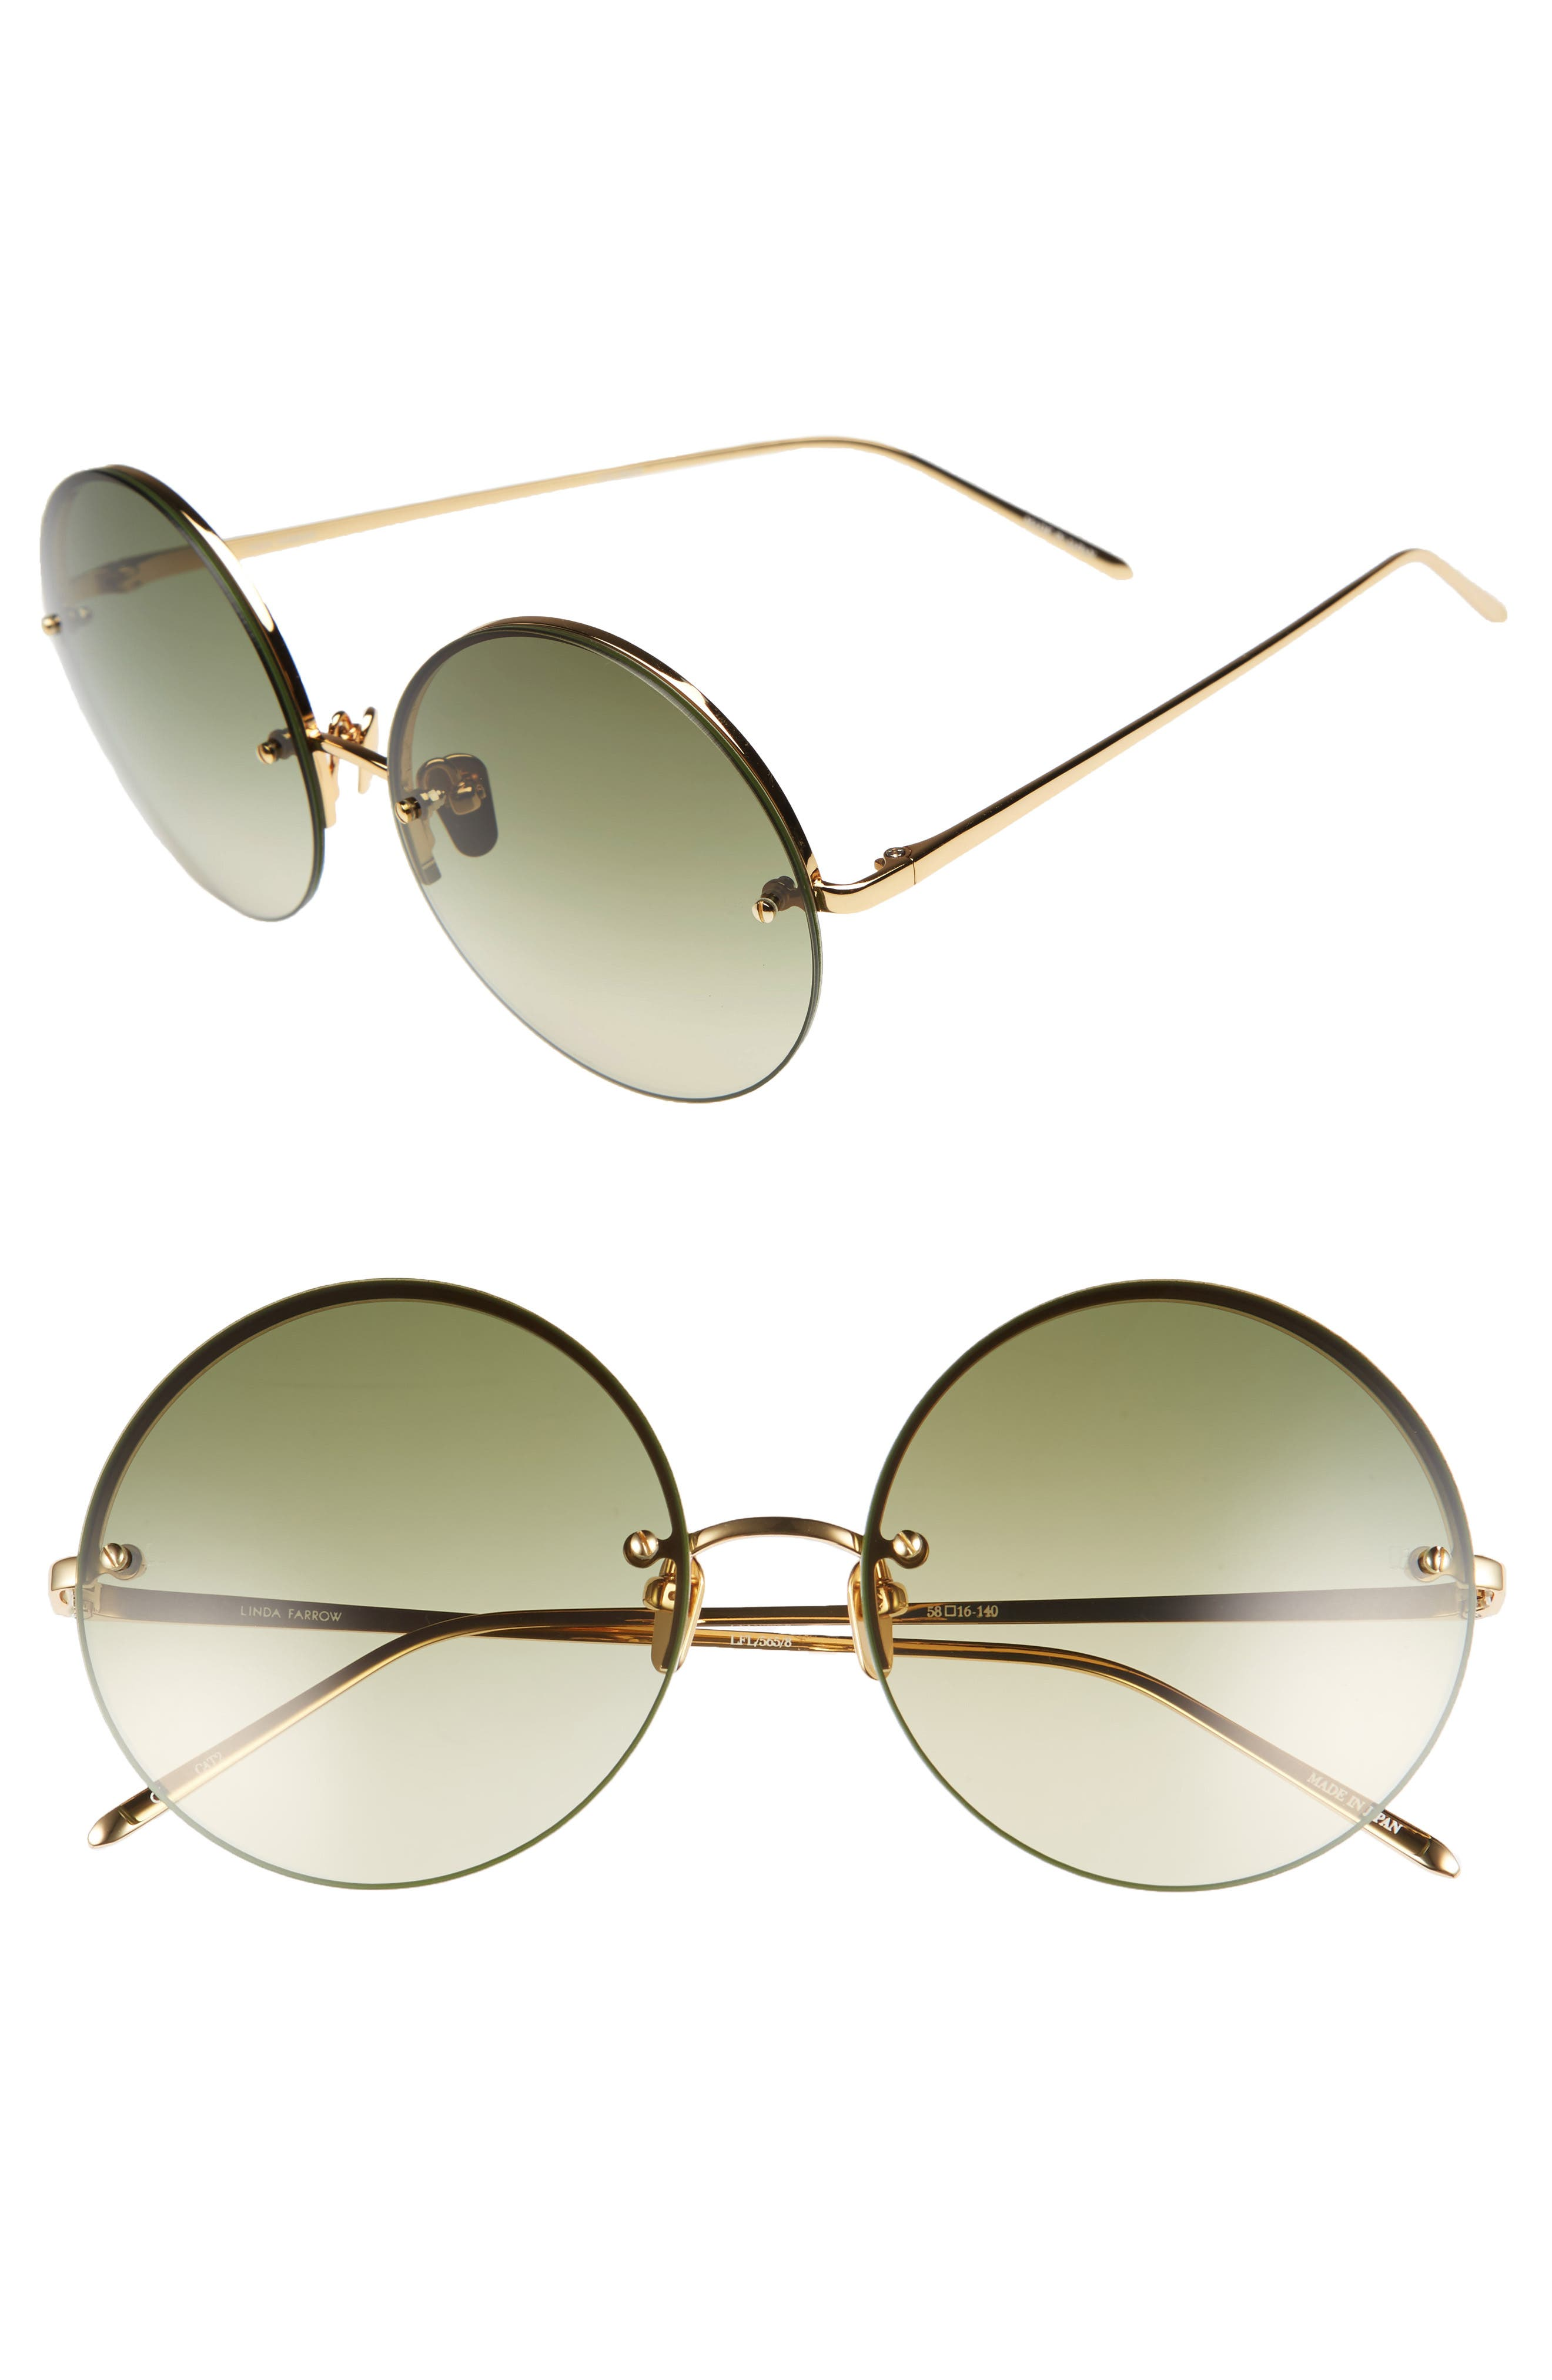 LINDA FARROW 58mm Gradient Round Sunglasses